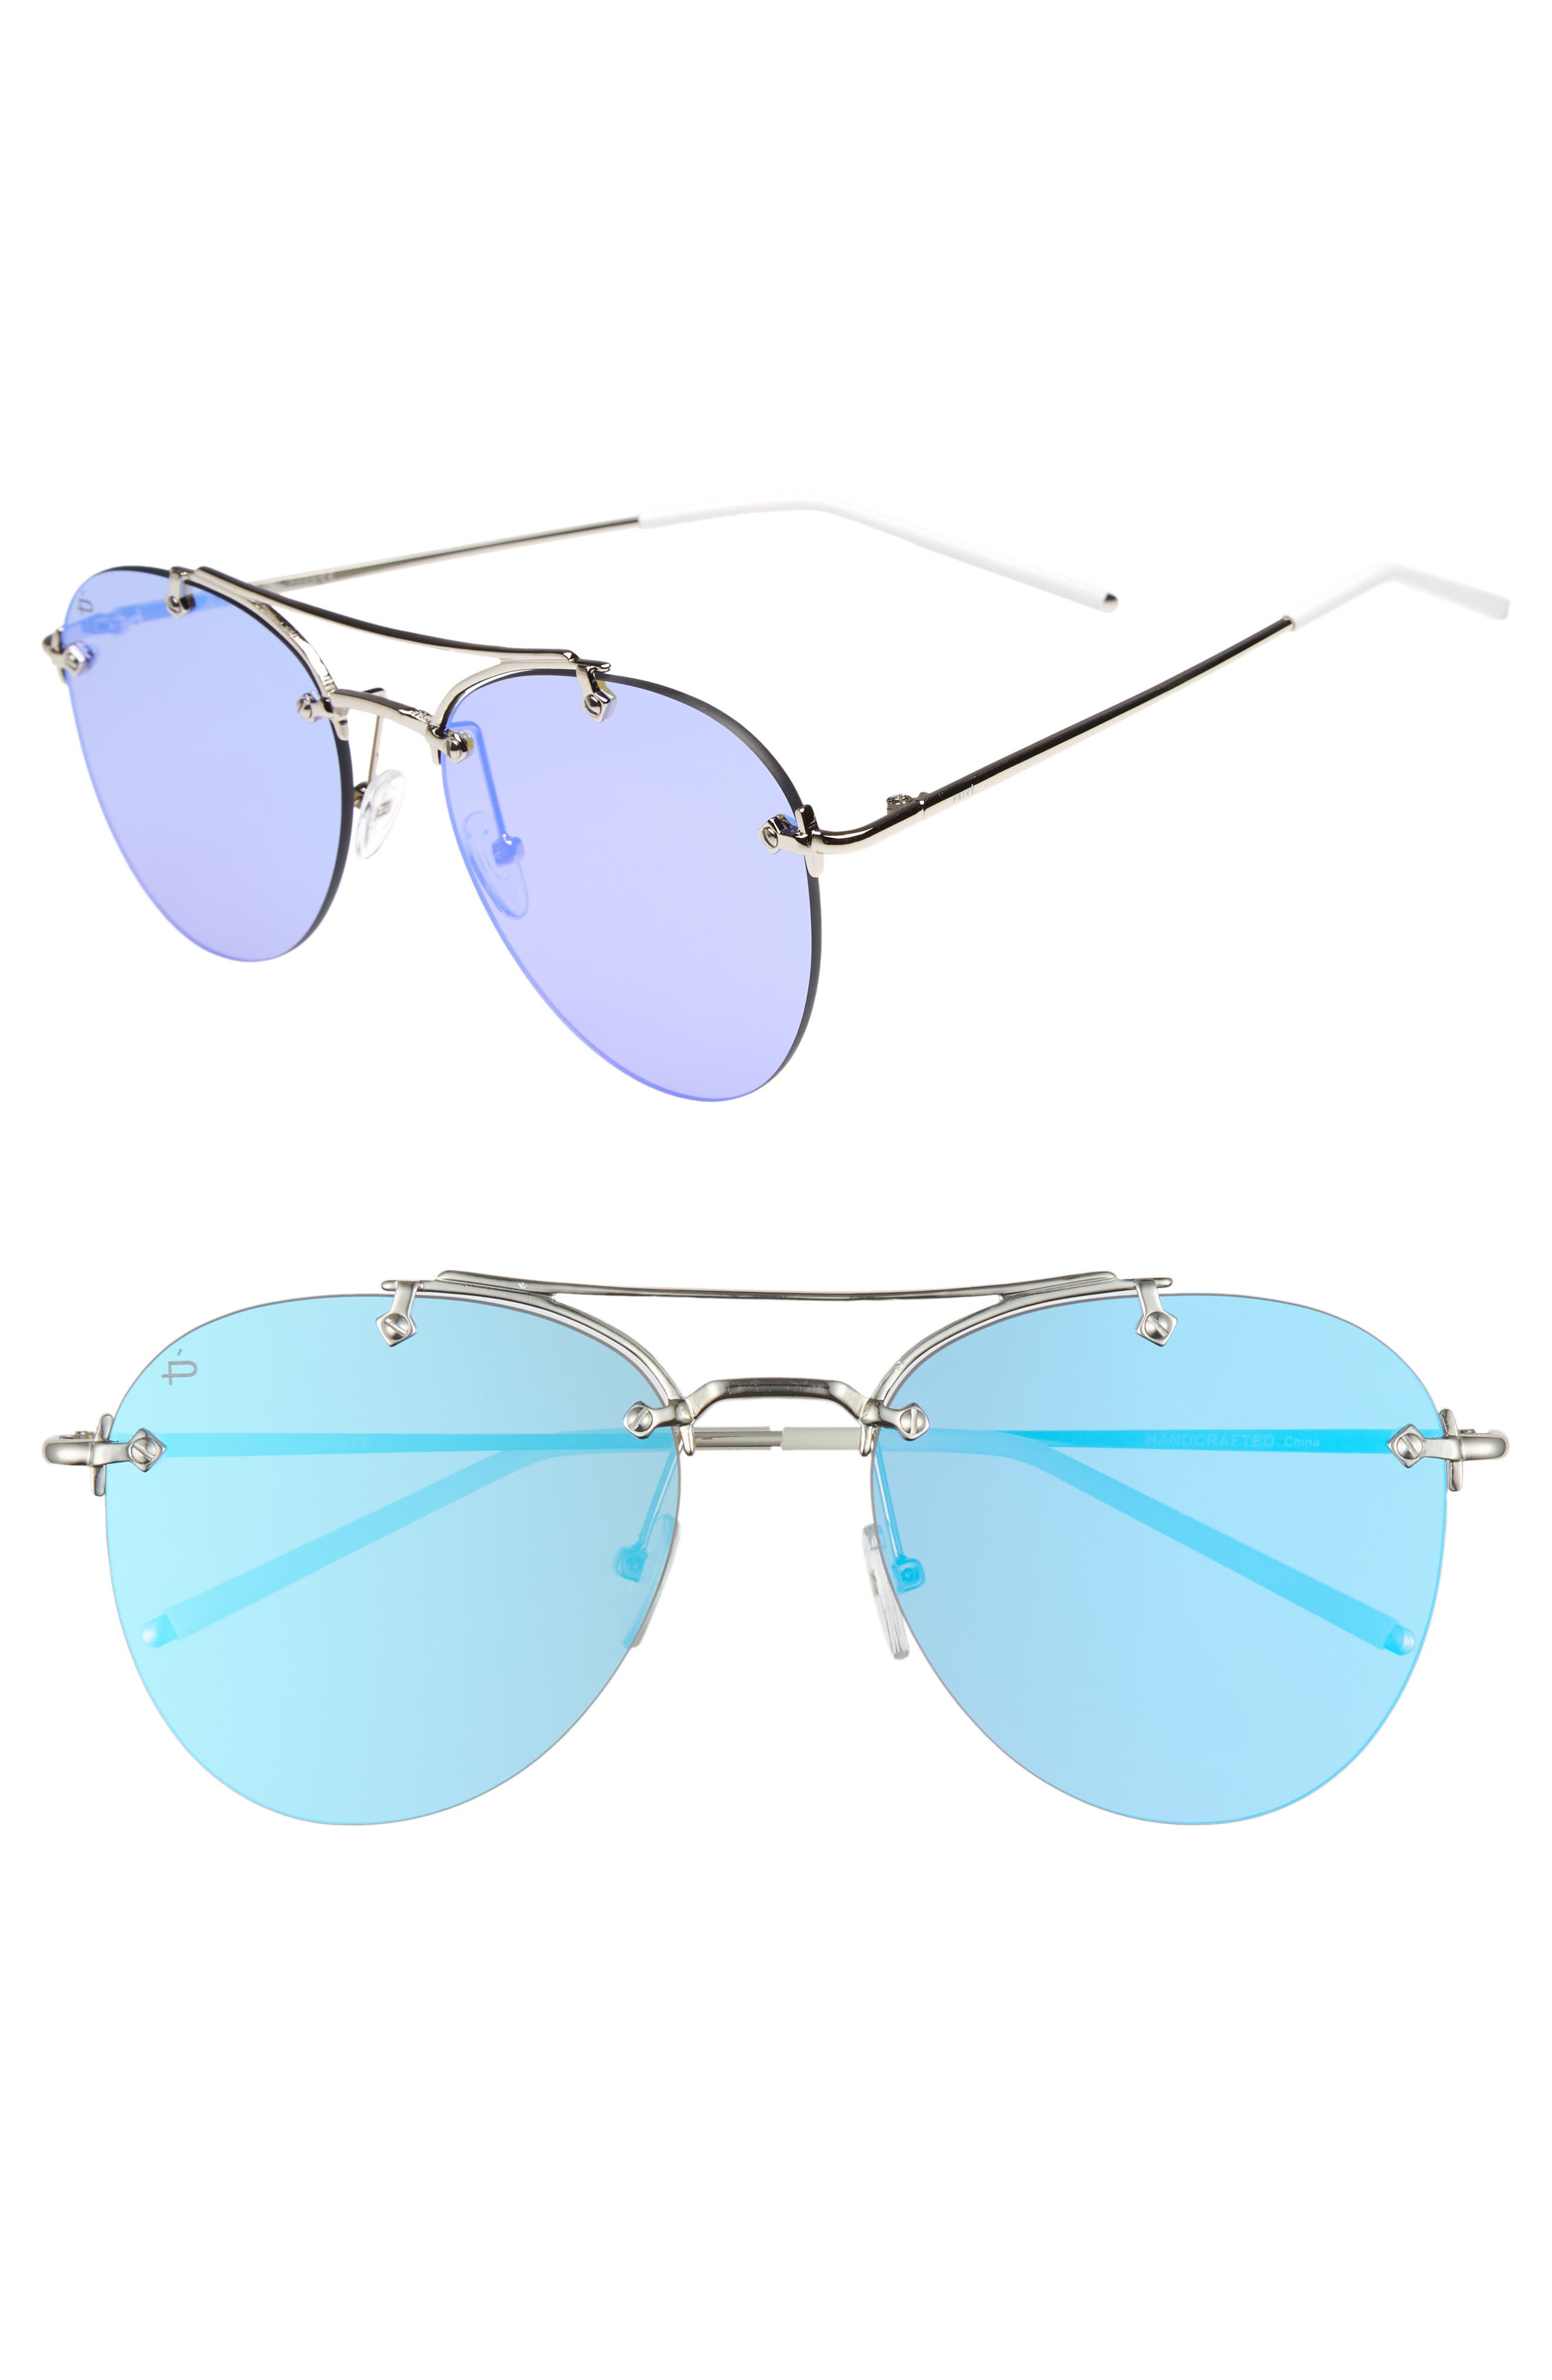 Privé Revaux The Dutchess 57mm Aviator Sunglasses,                             Main thumbnail 1, color,                             Silver